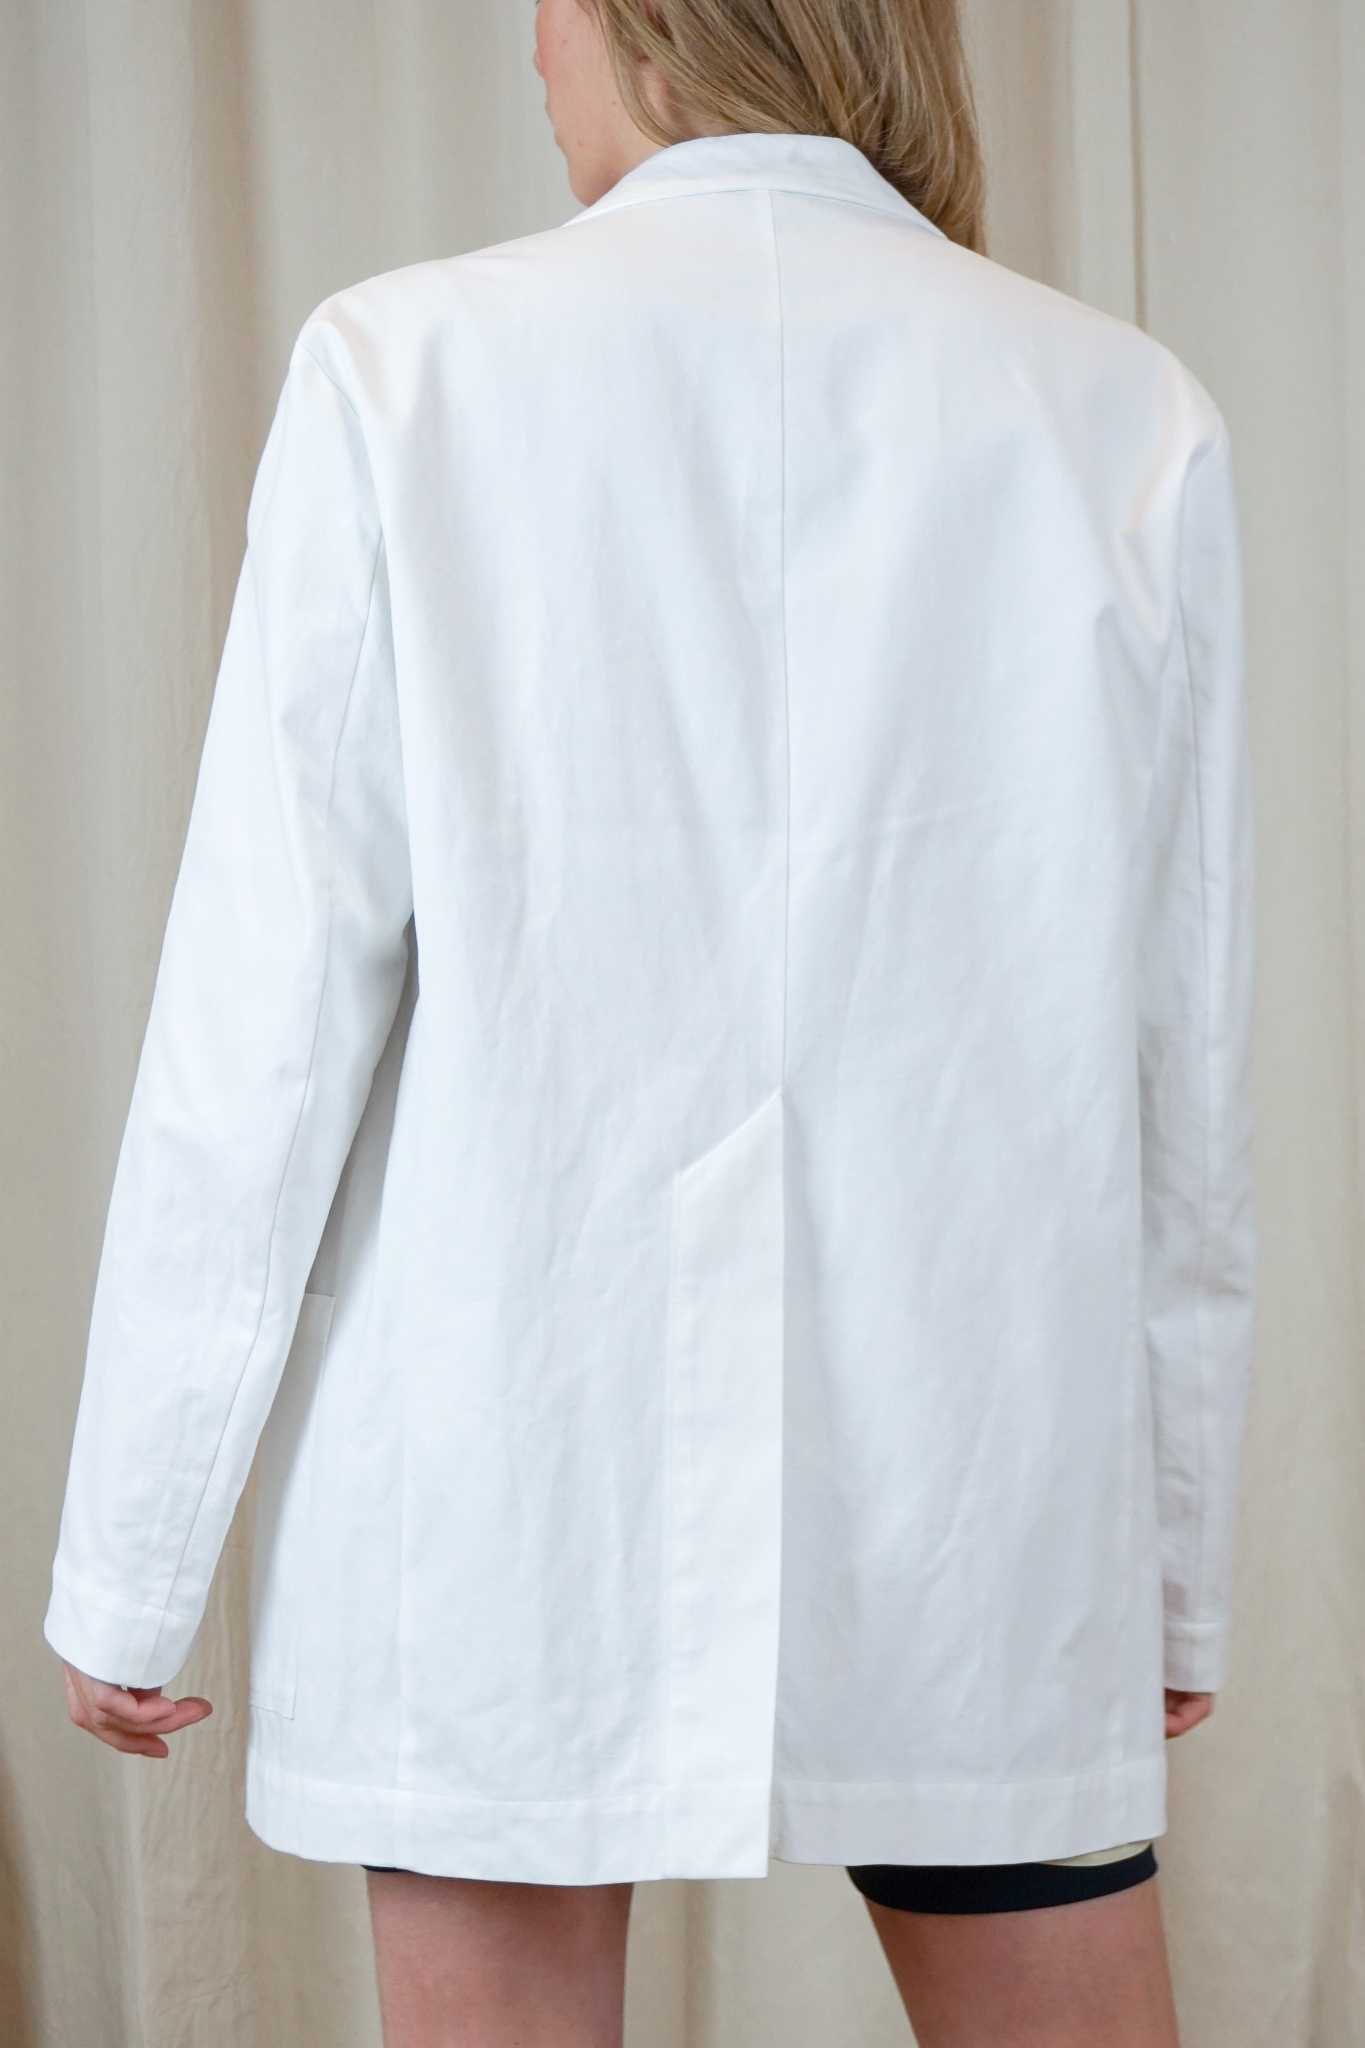 Don colbert White Cotton